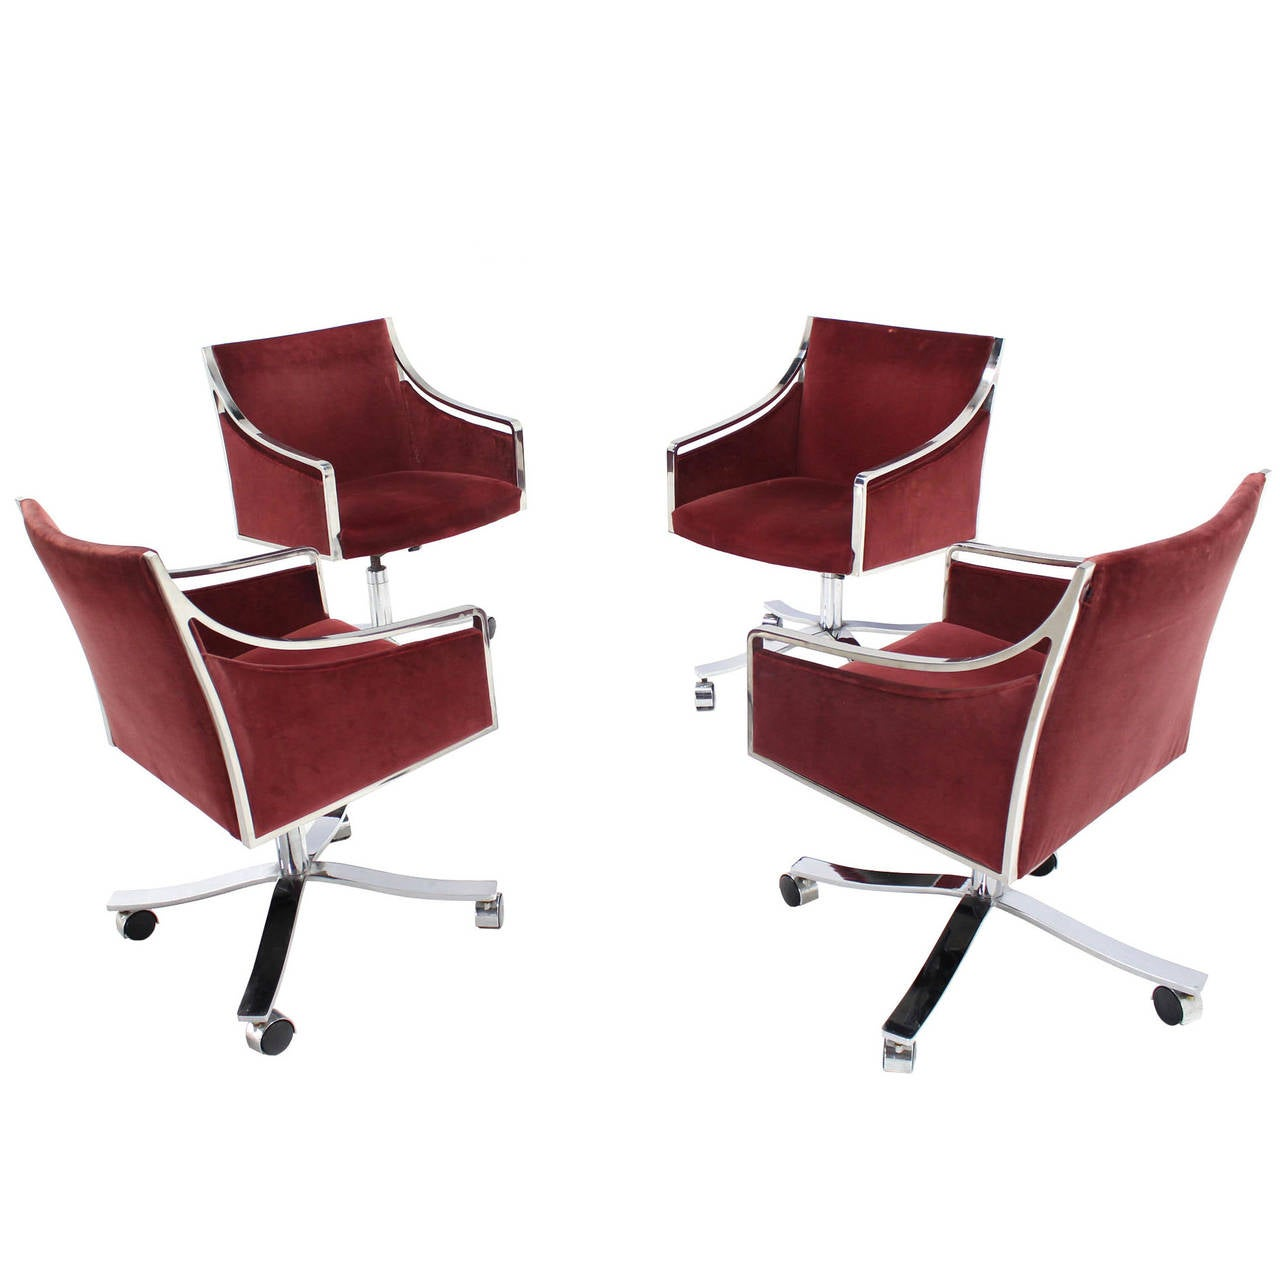 steel chair for office restoration hardware desk set of four stow davis borsani chairs on heavy